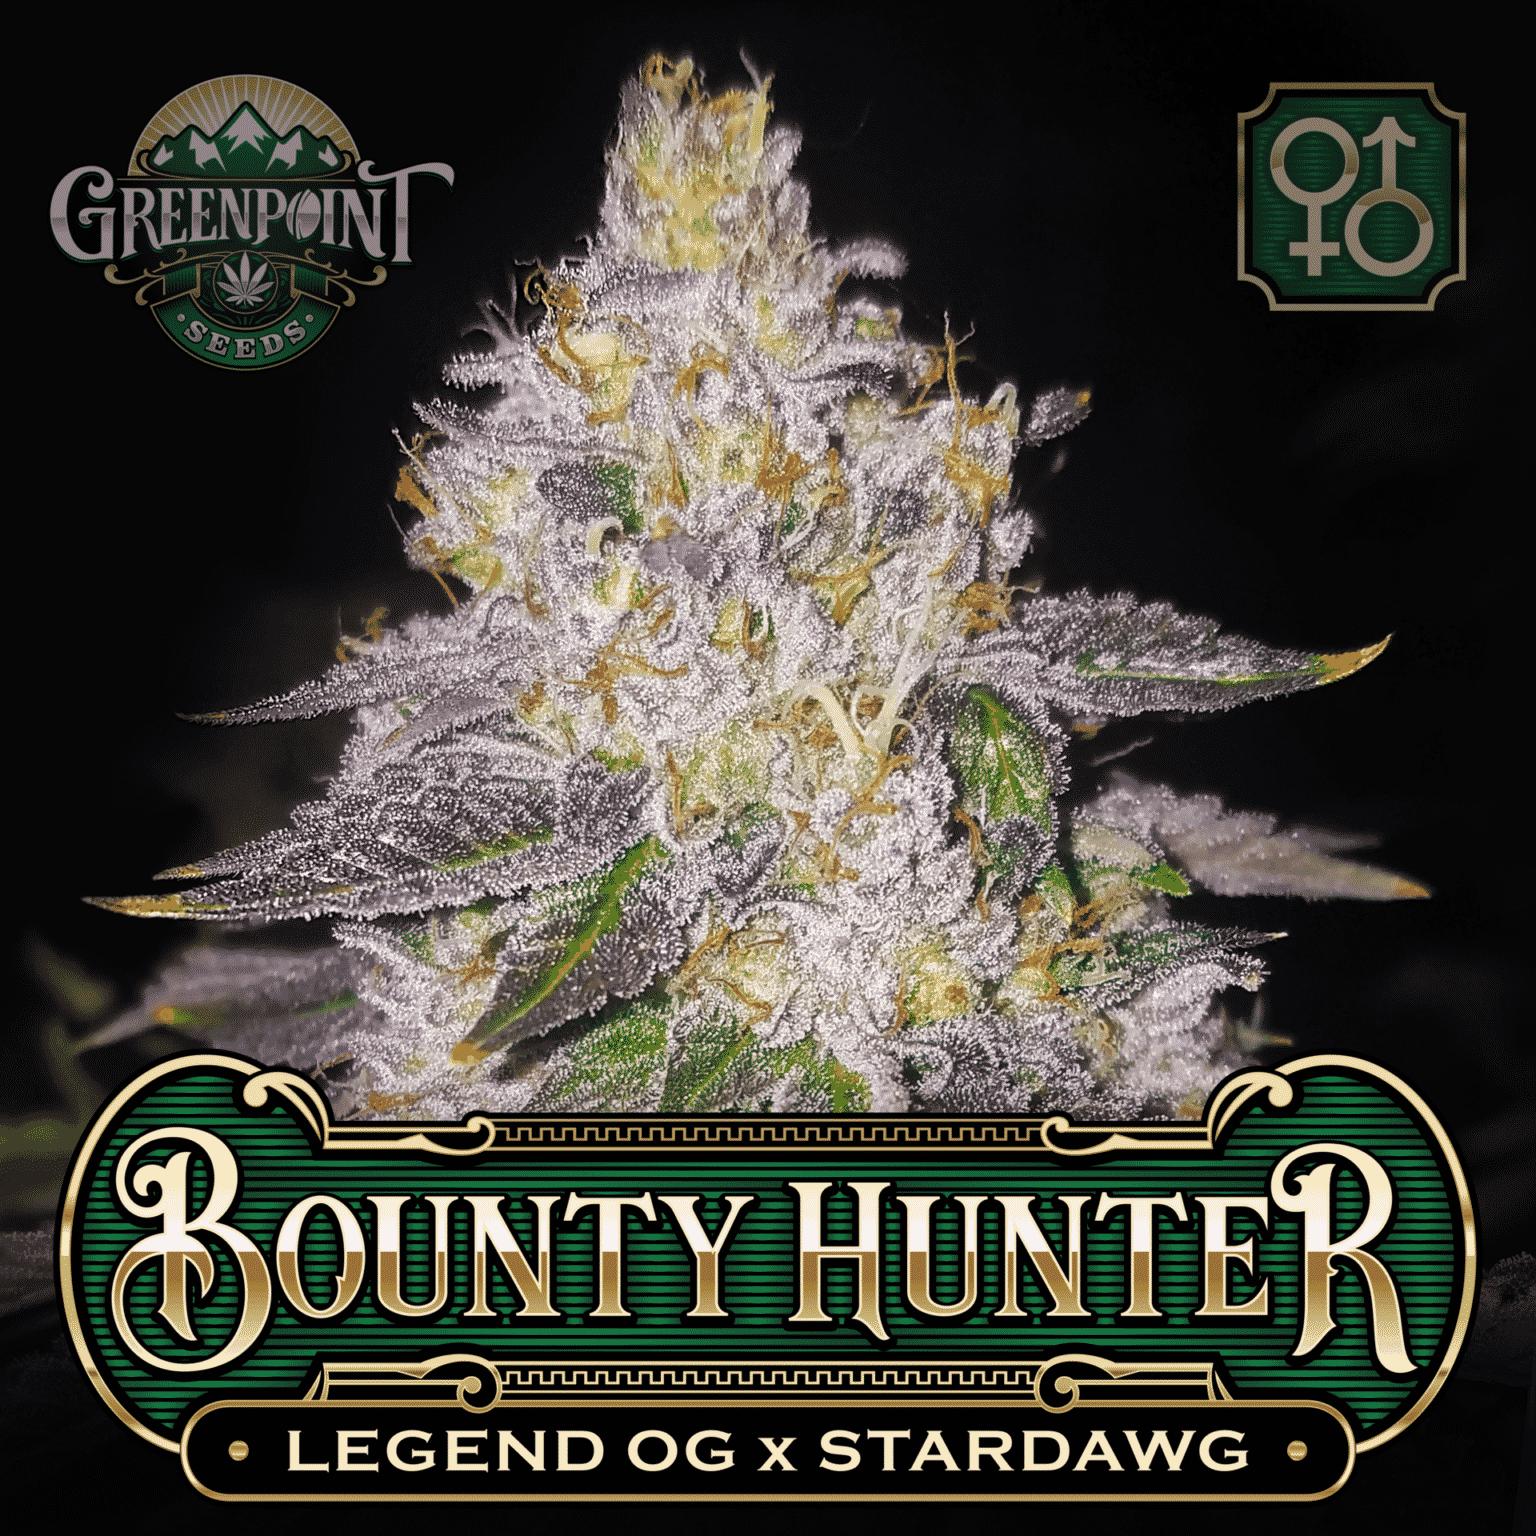 Legend OG x Stardawg Seeds - Bounty Hunter Cannabis Seeds - US Seed Bank